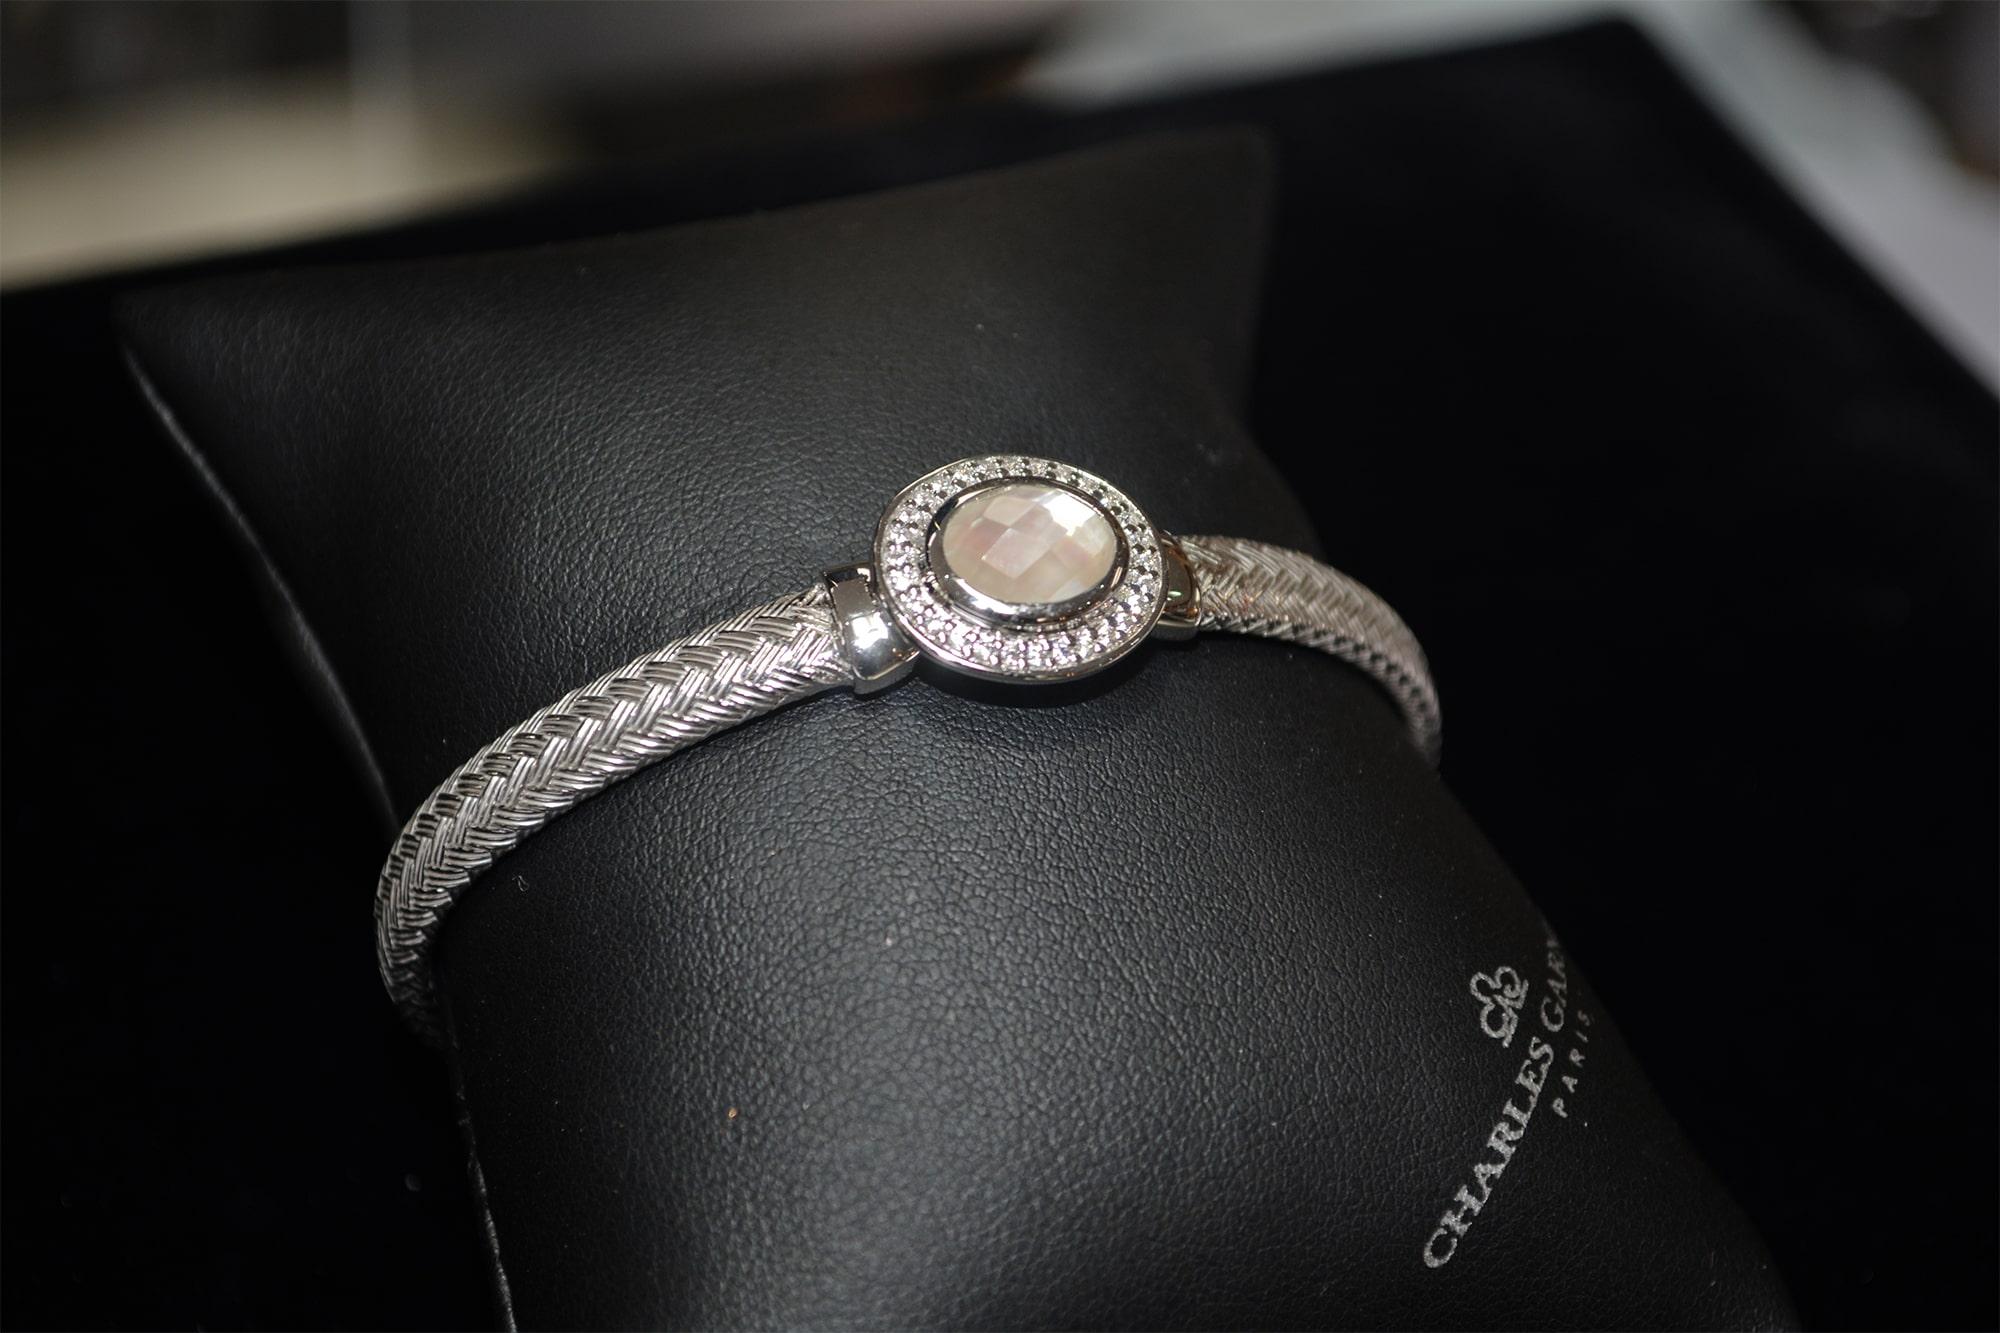 Breathtaking Jewelry From Charles Garnier